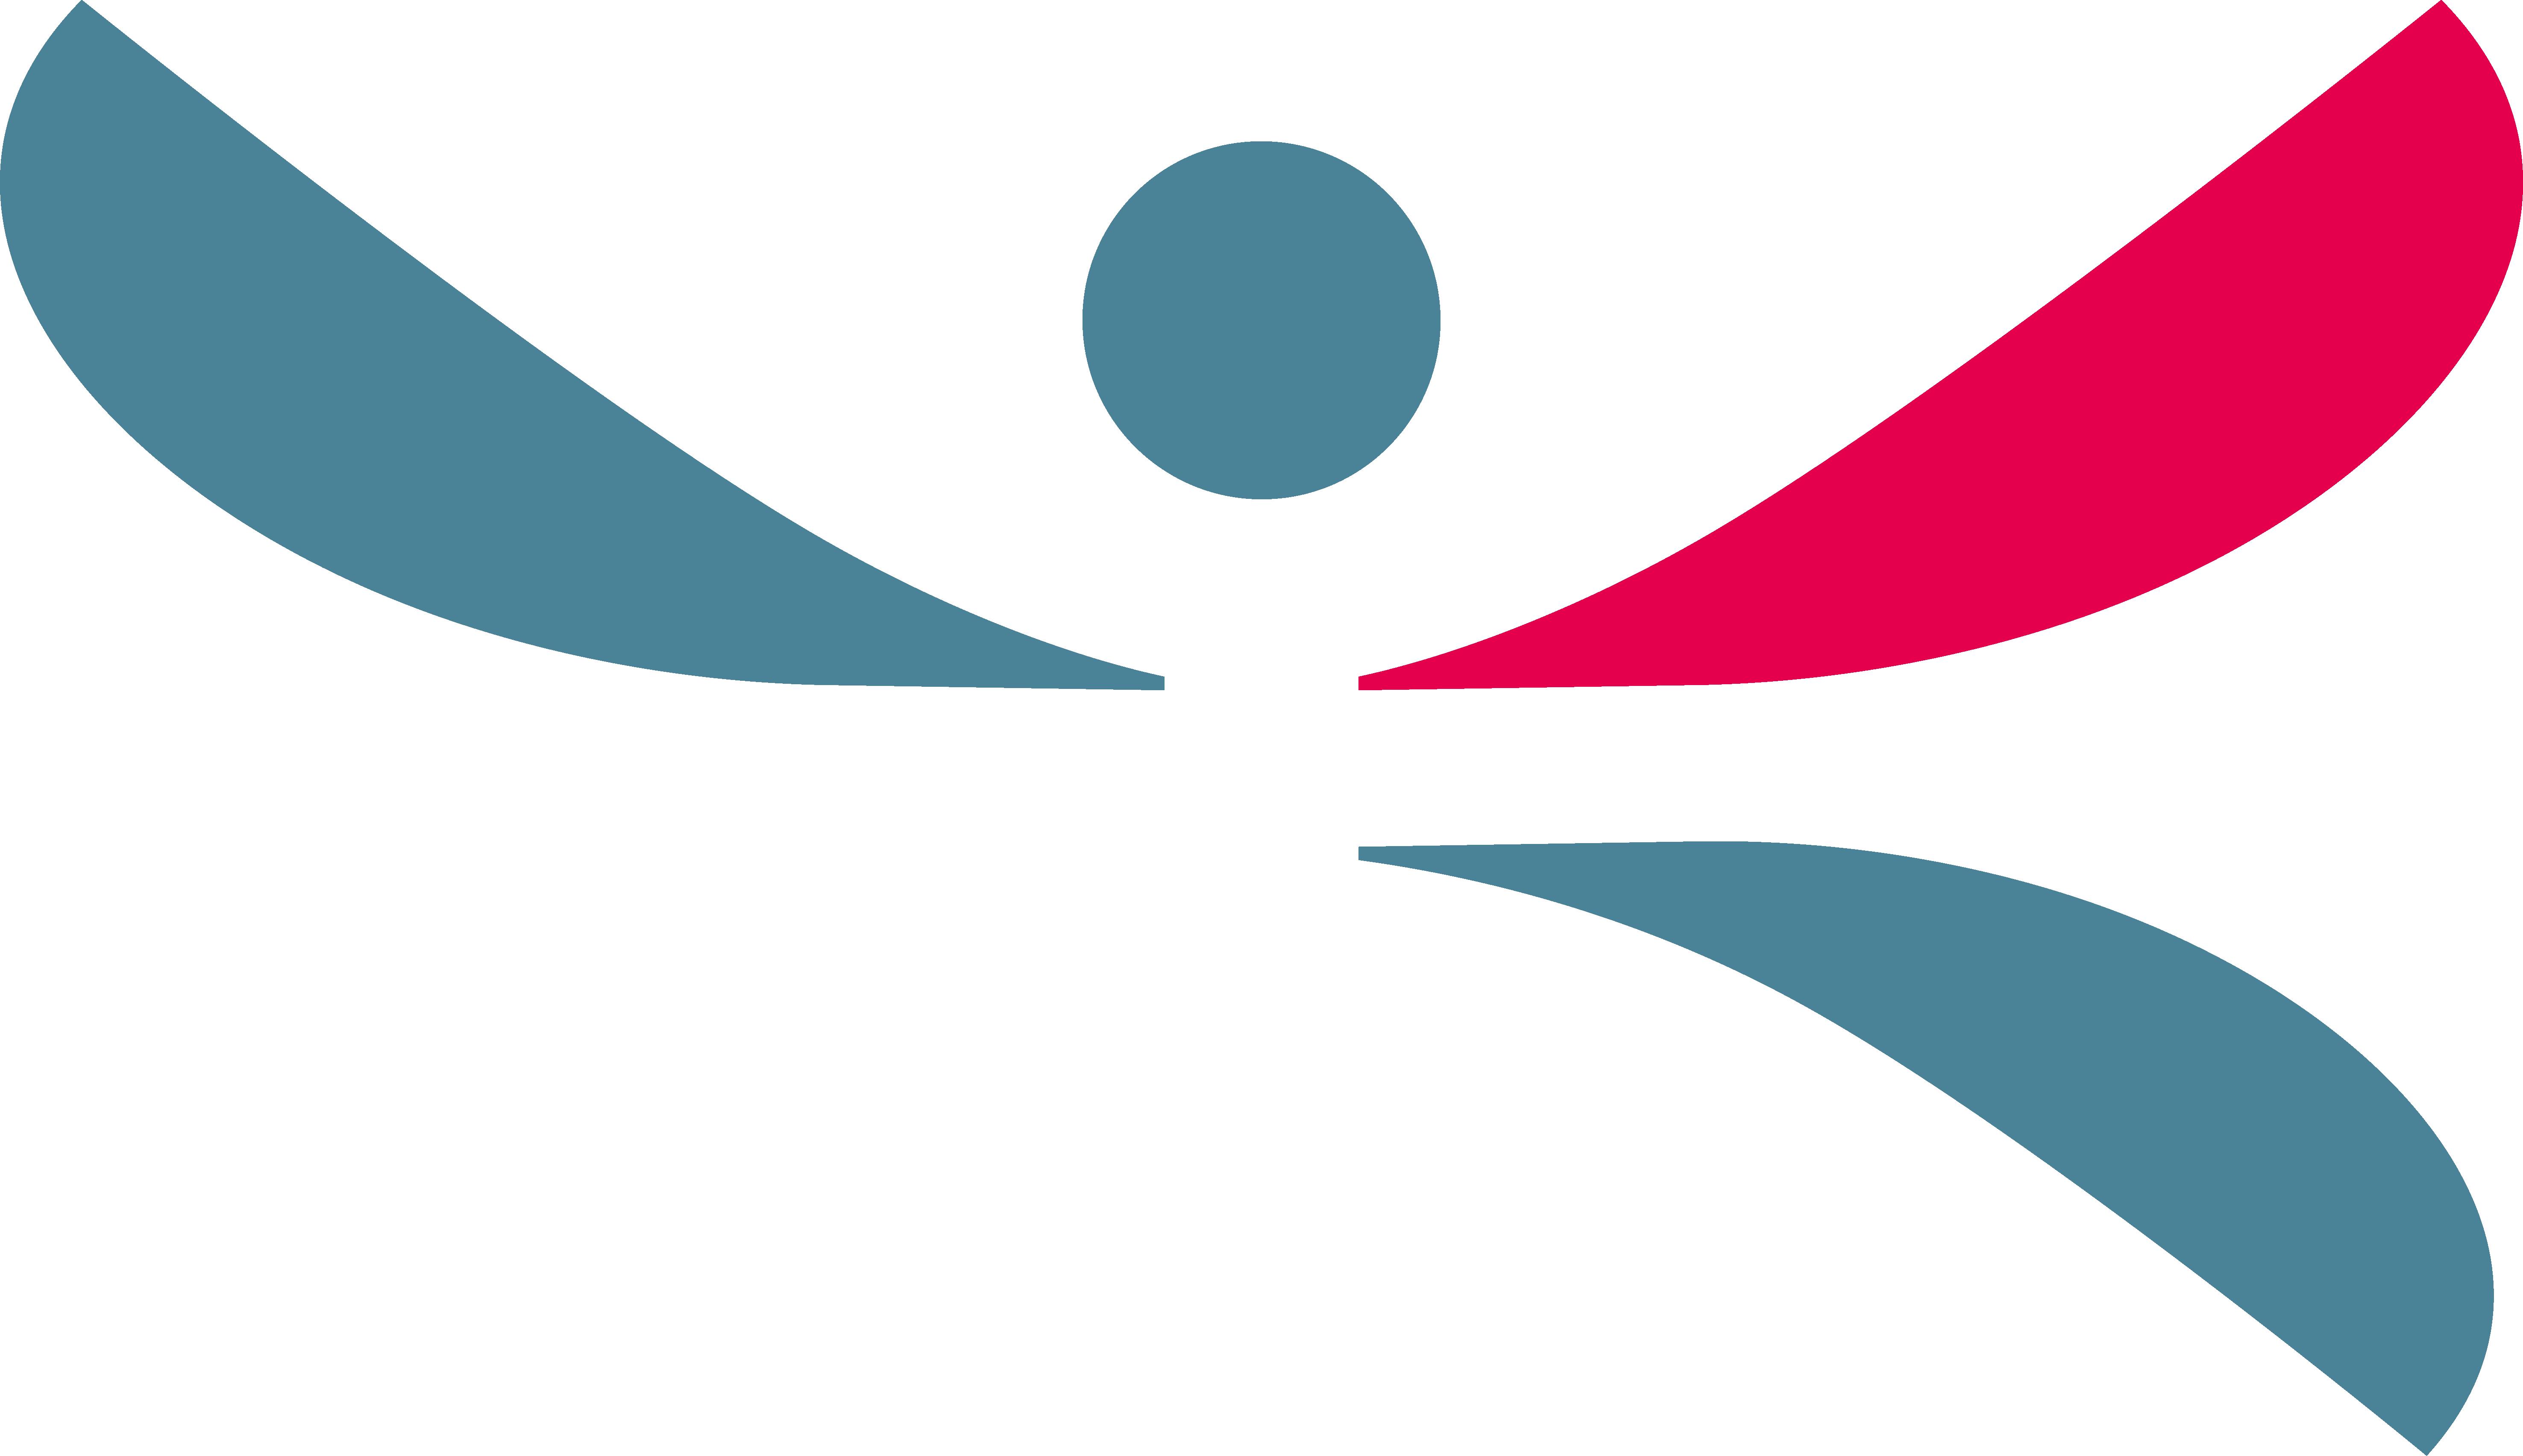 Libellule du logo Adhap